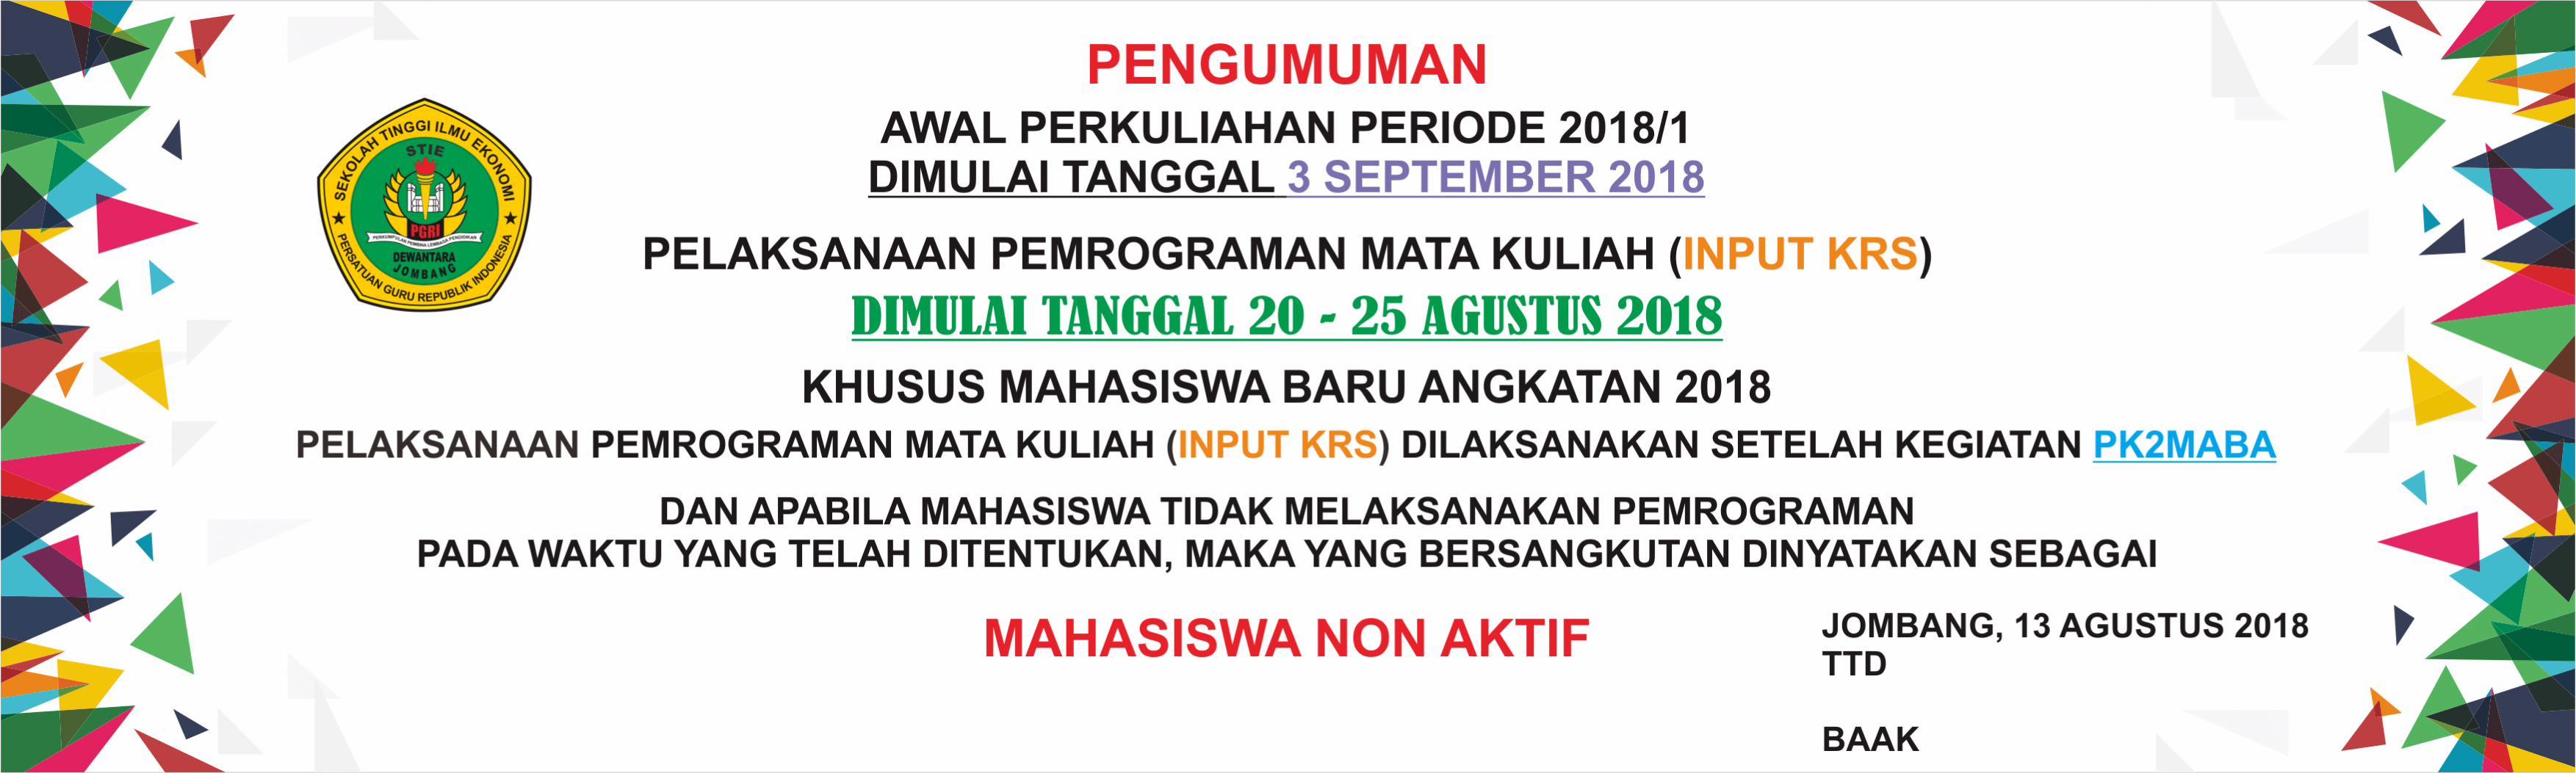 PENGUMUMAN PELAKSANAAN PEMROGRAMAN MATA KULIAH (INPUT KRS) TAHUN AKADEMIK 2018-2019